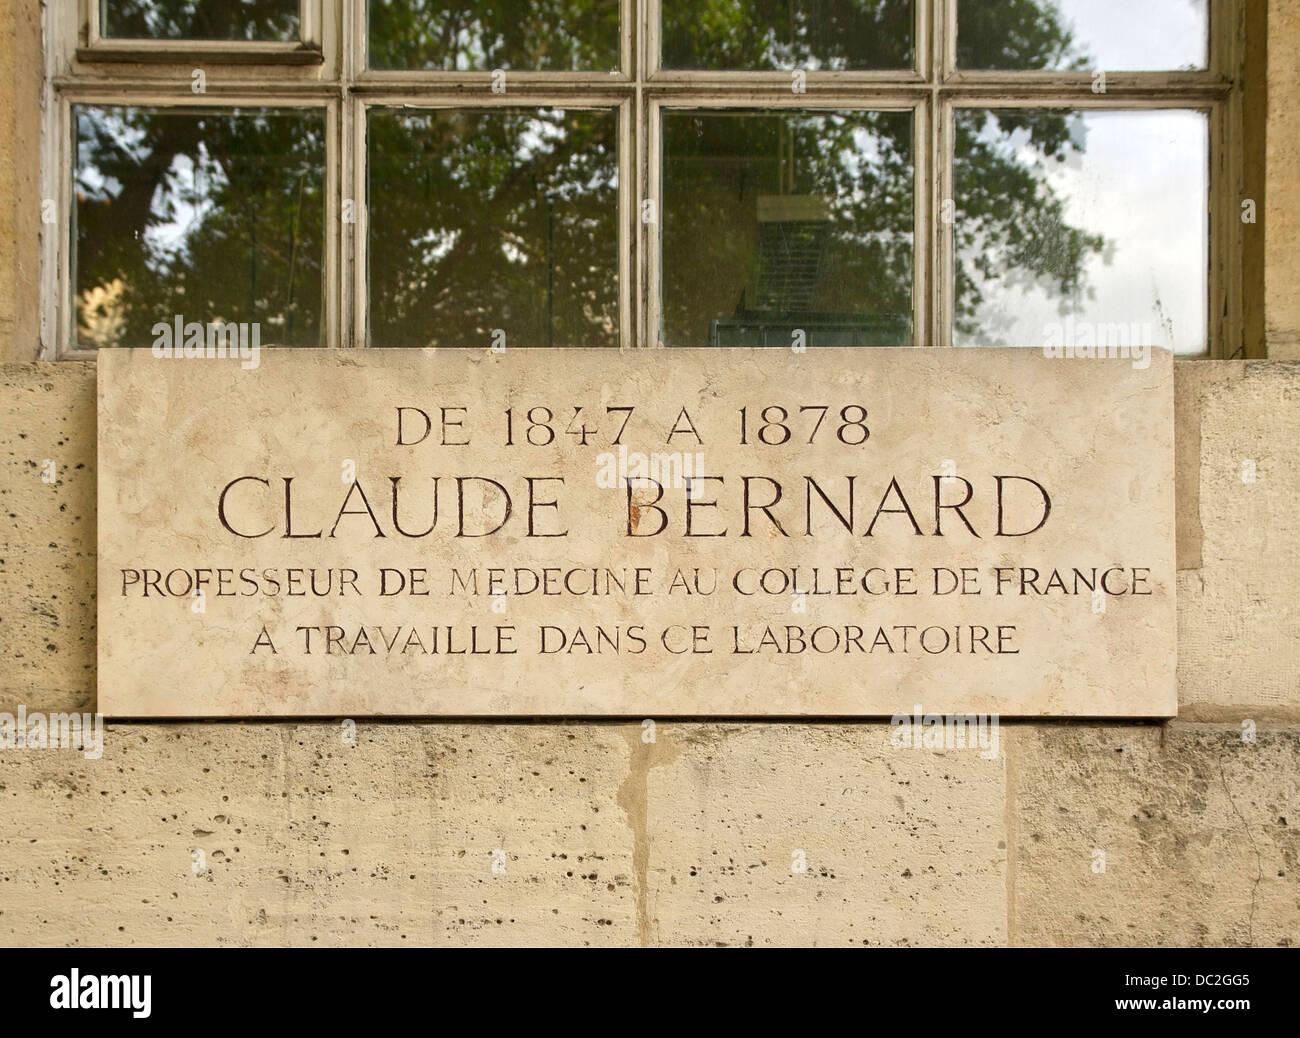 Gedenktafel in Hommage an Claude Bernard, am Collège de France in Paris, Frankreich. Stockbild